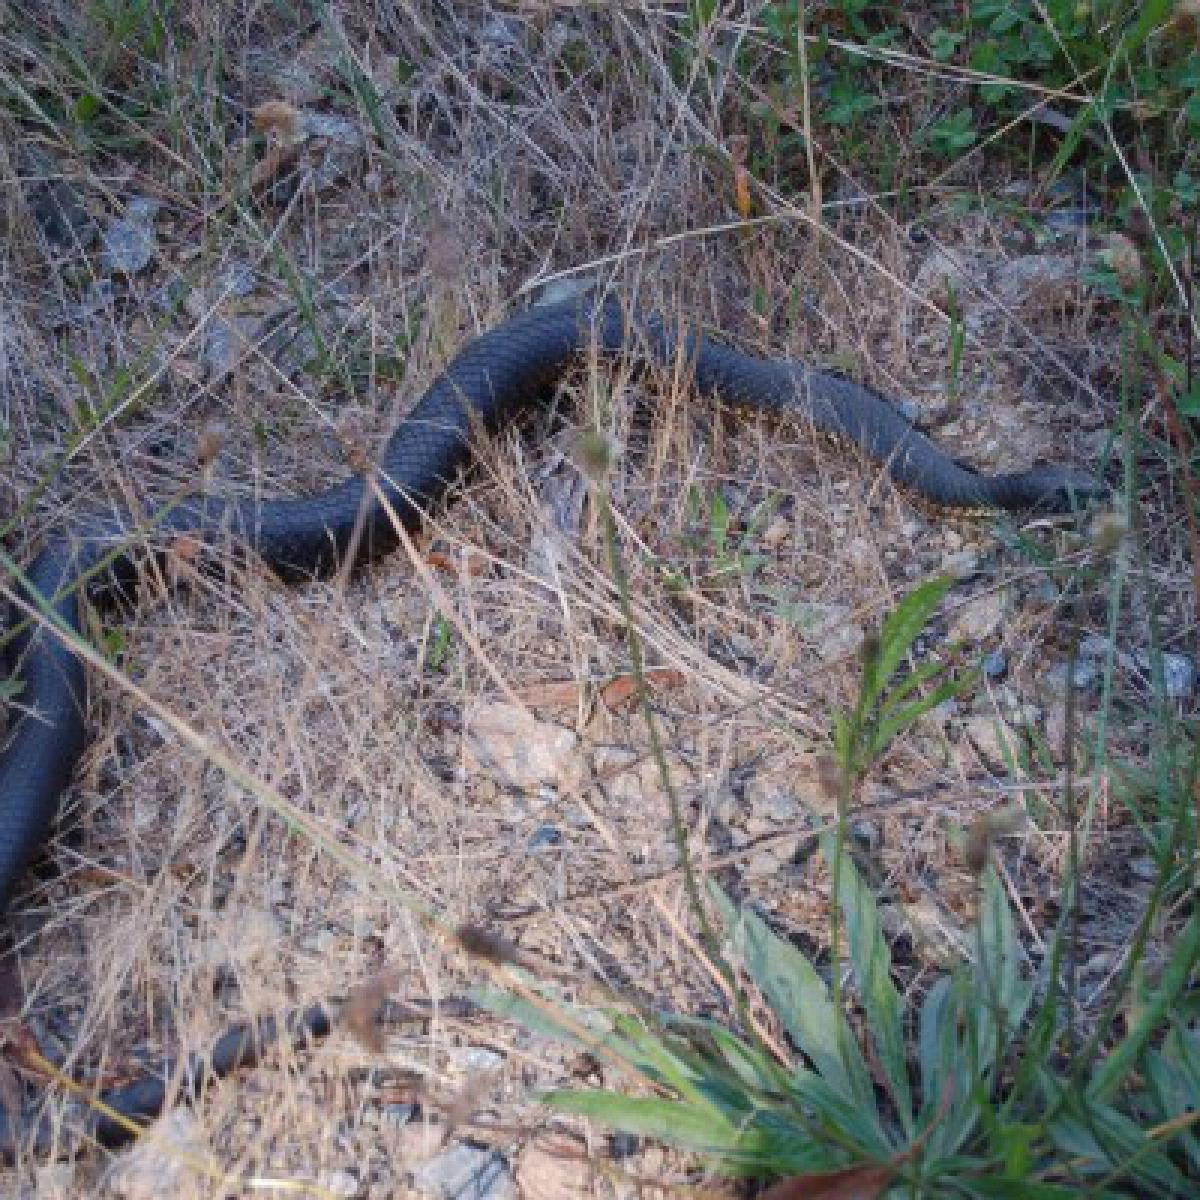 Mainland Tiger snake (Notechis scutatus)